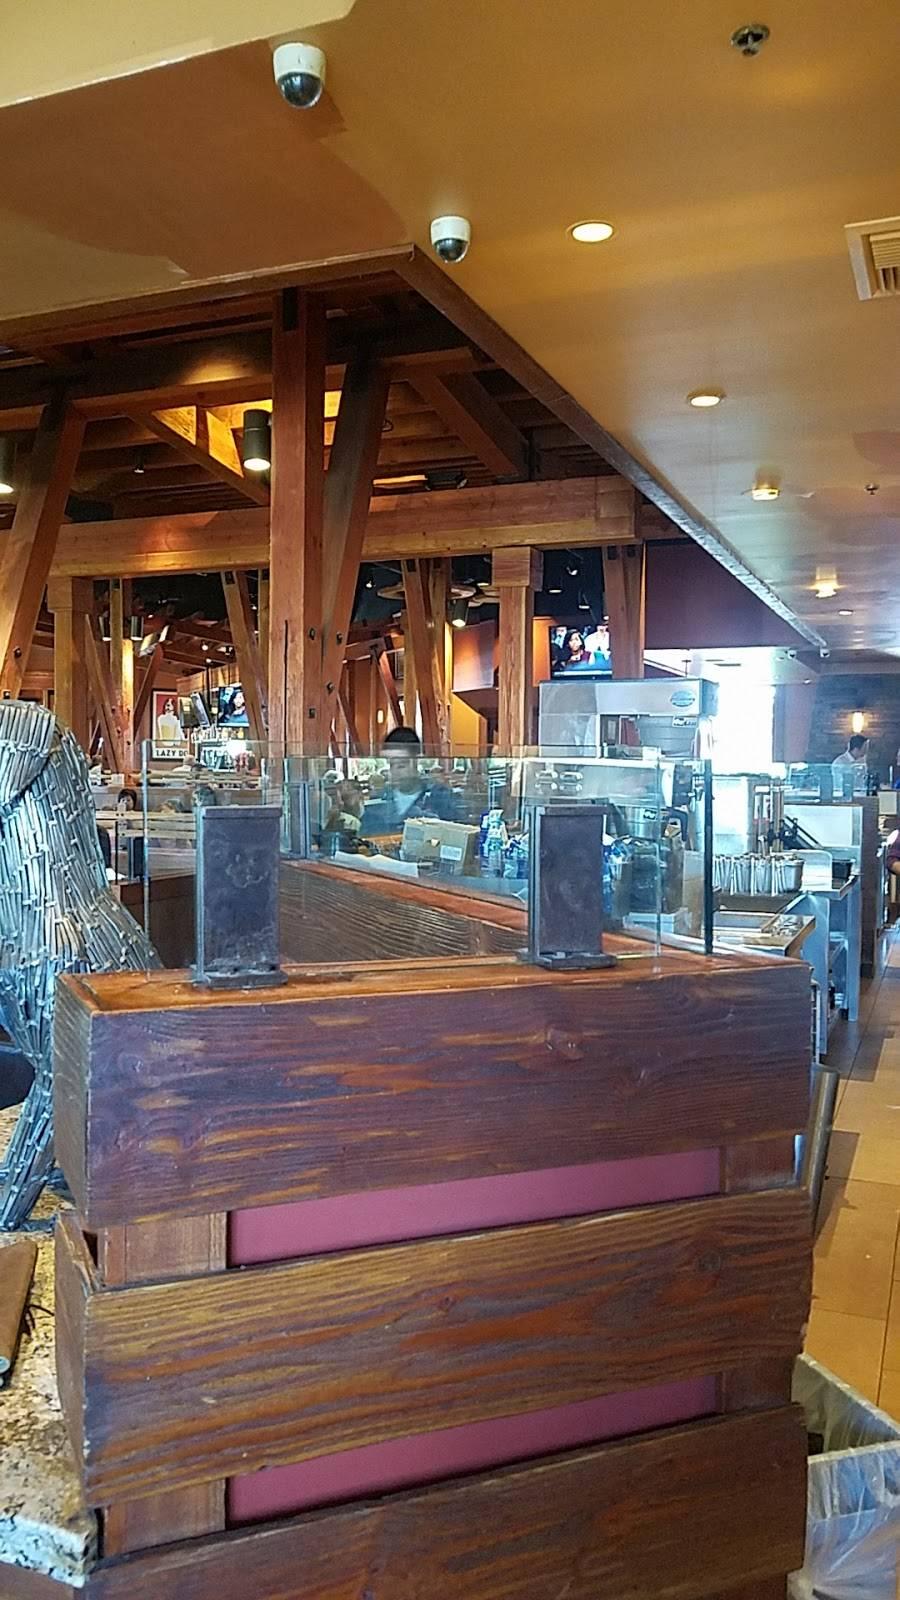 Lazy Dog Restaurant & Bar | 1623 W Katella Ave, Orange, CA 92867, USA